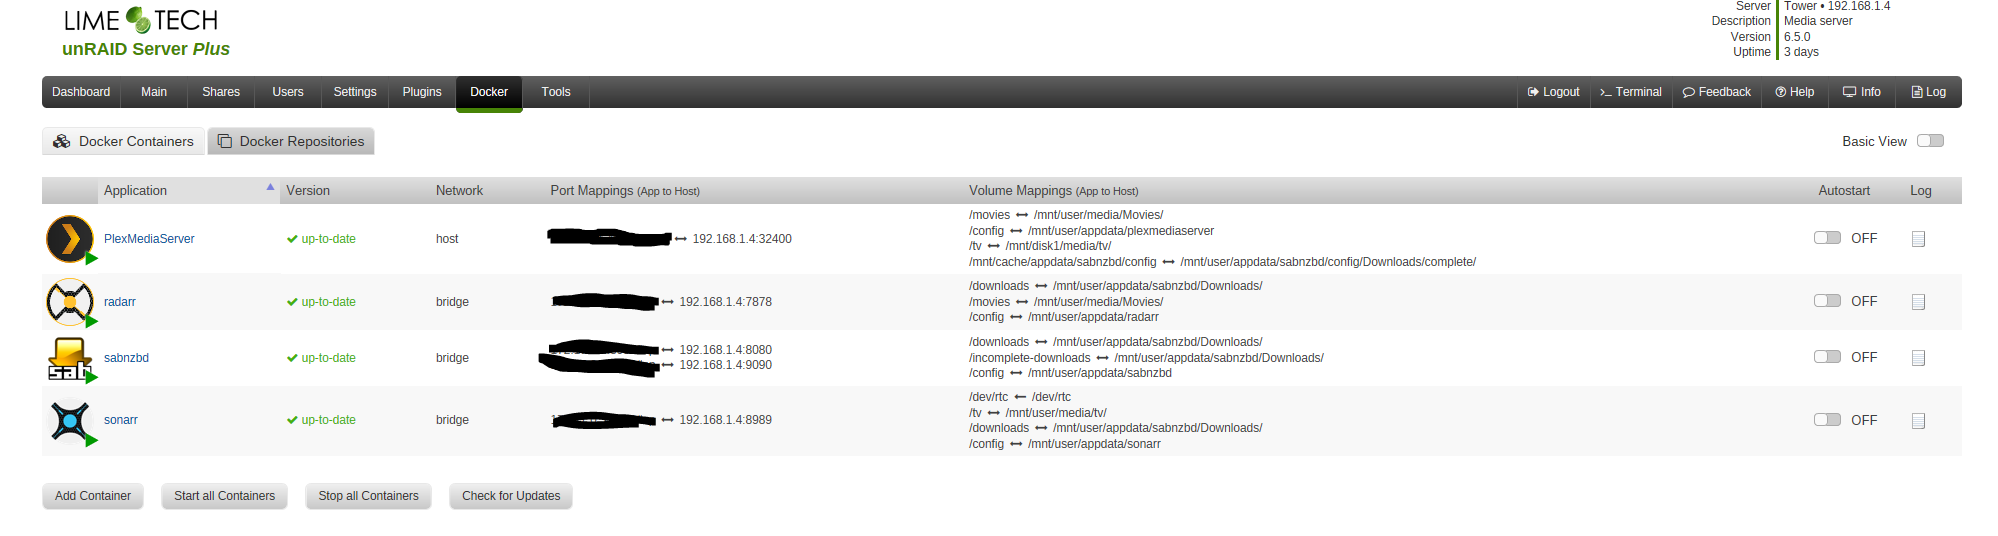 Unraid 6 docker issue - Help & Support - sonarr :: forums